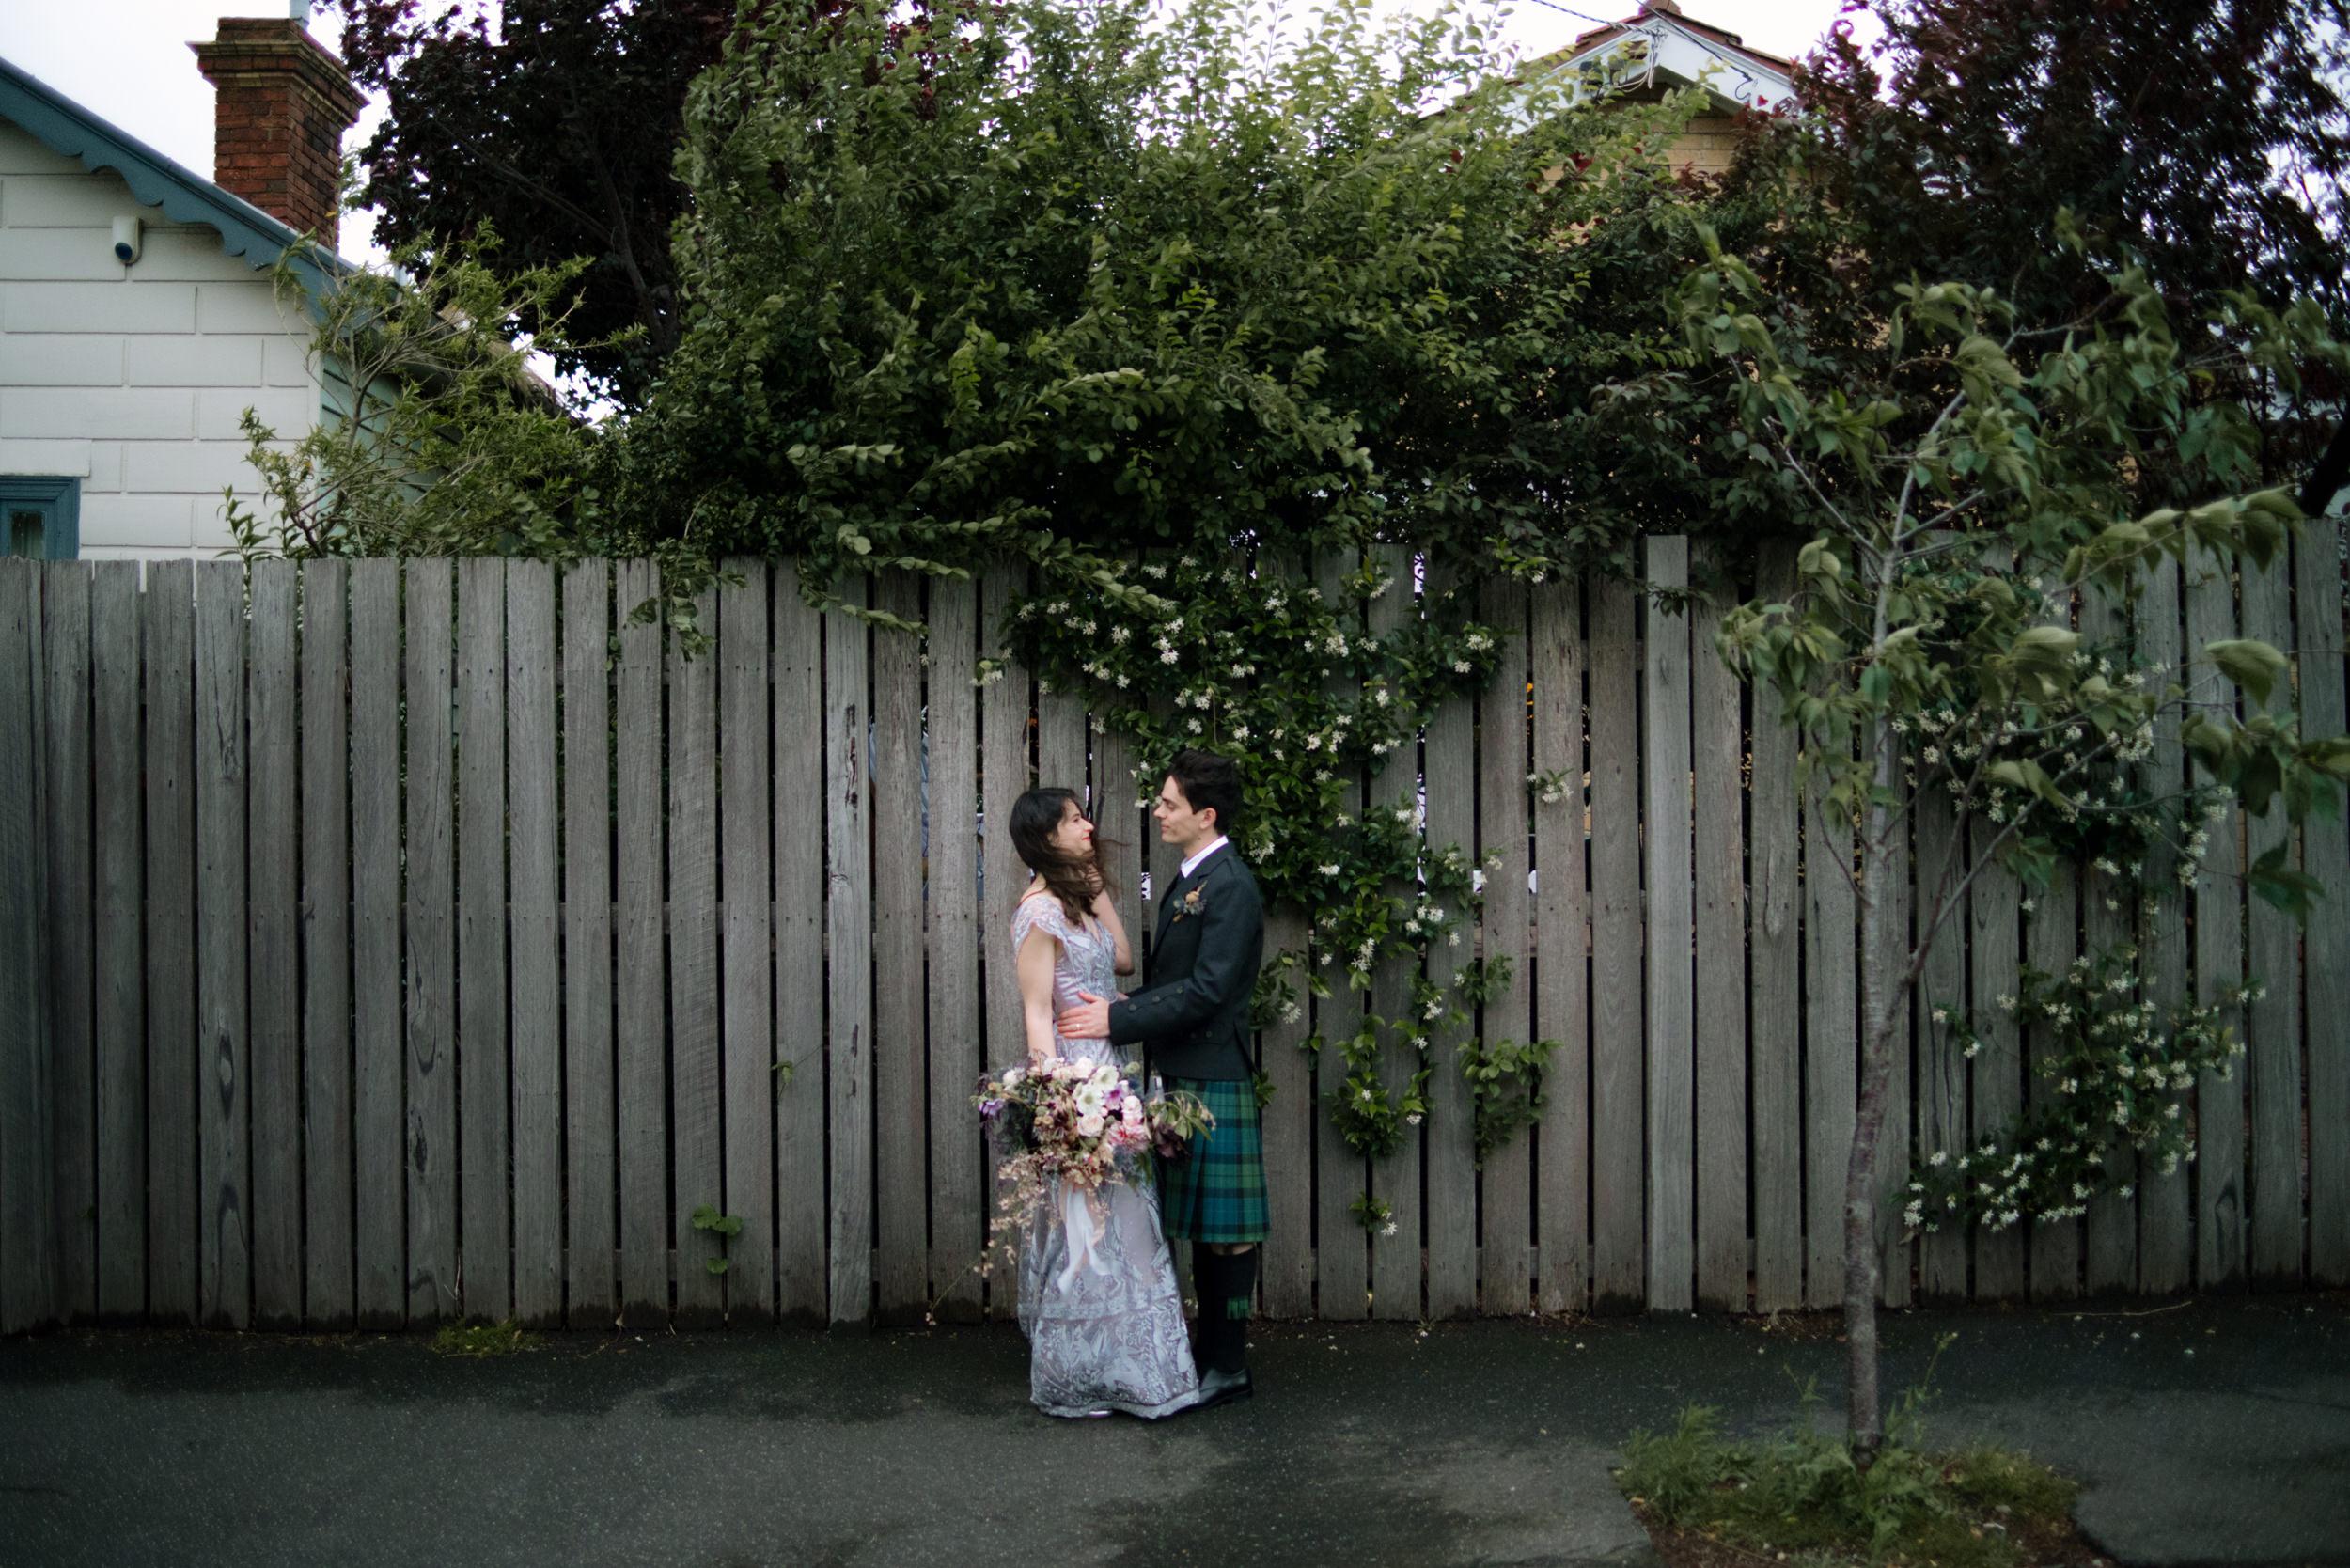 I-Got-You-Babe-&.Co.-Glasshaus-Wedding-Charlotte-Cameron0113.JPG